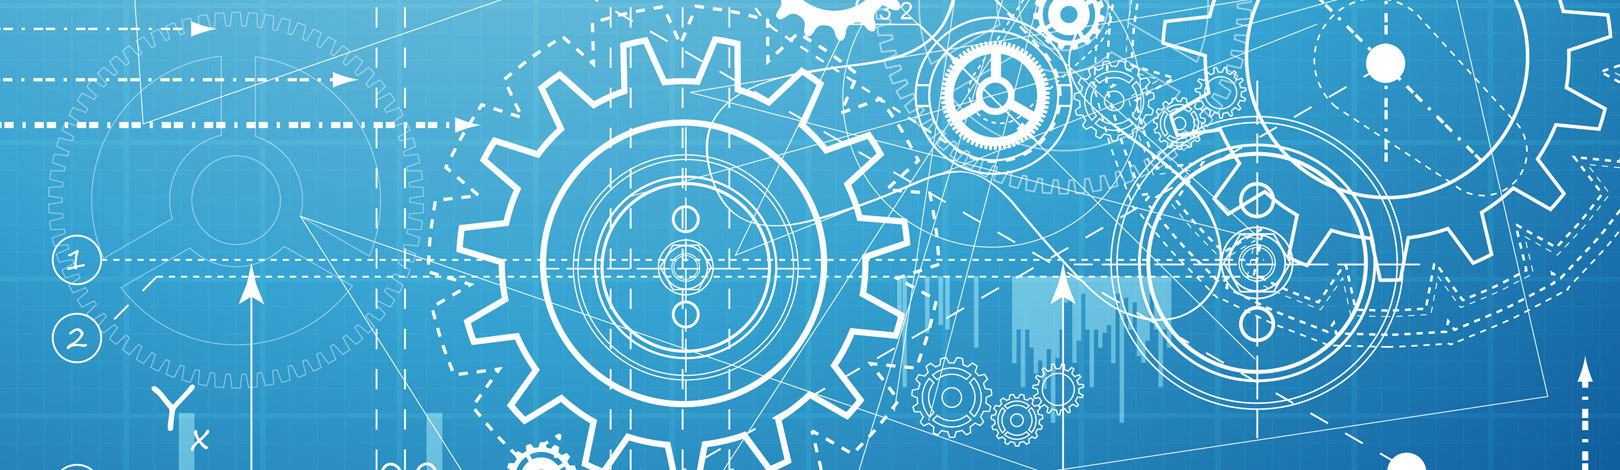 Patent Innovation: Design Patents